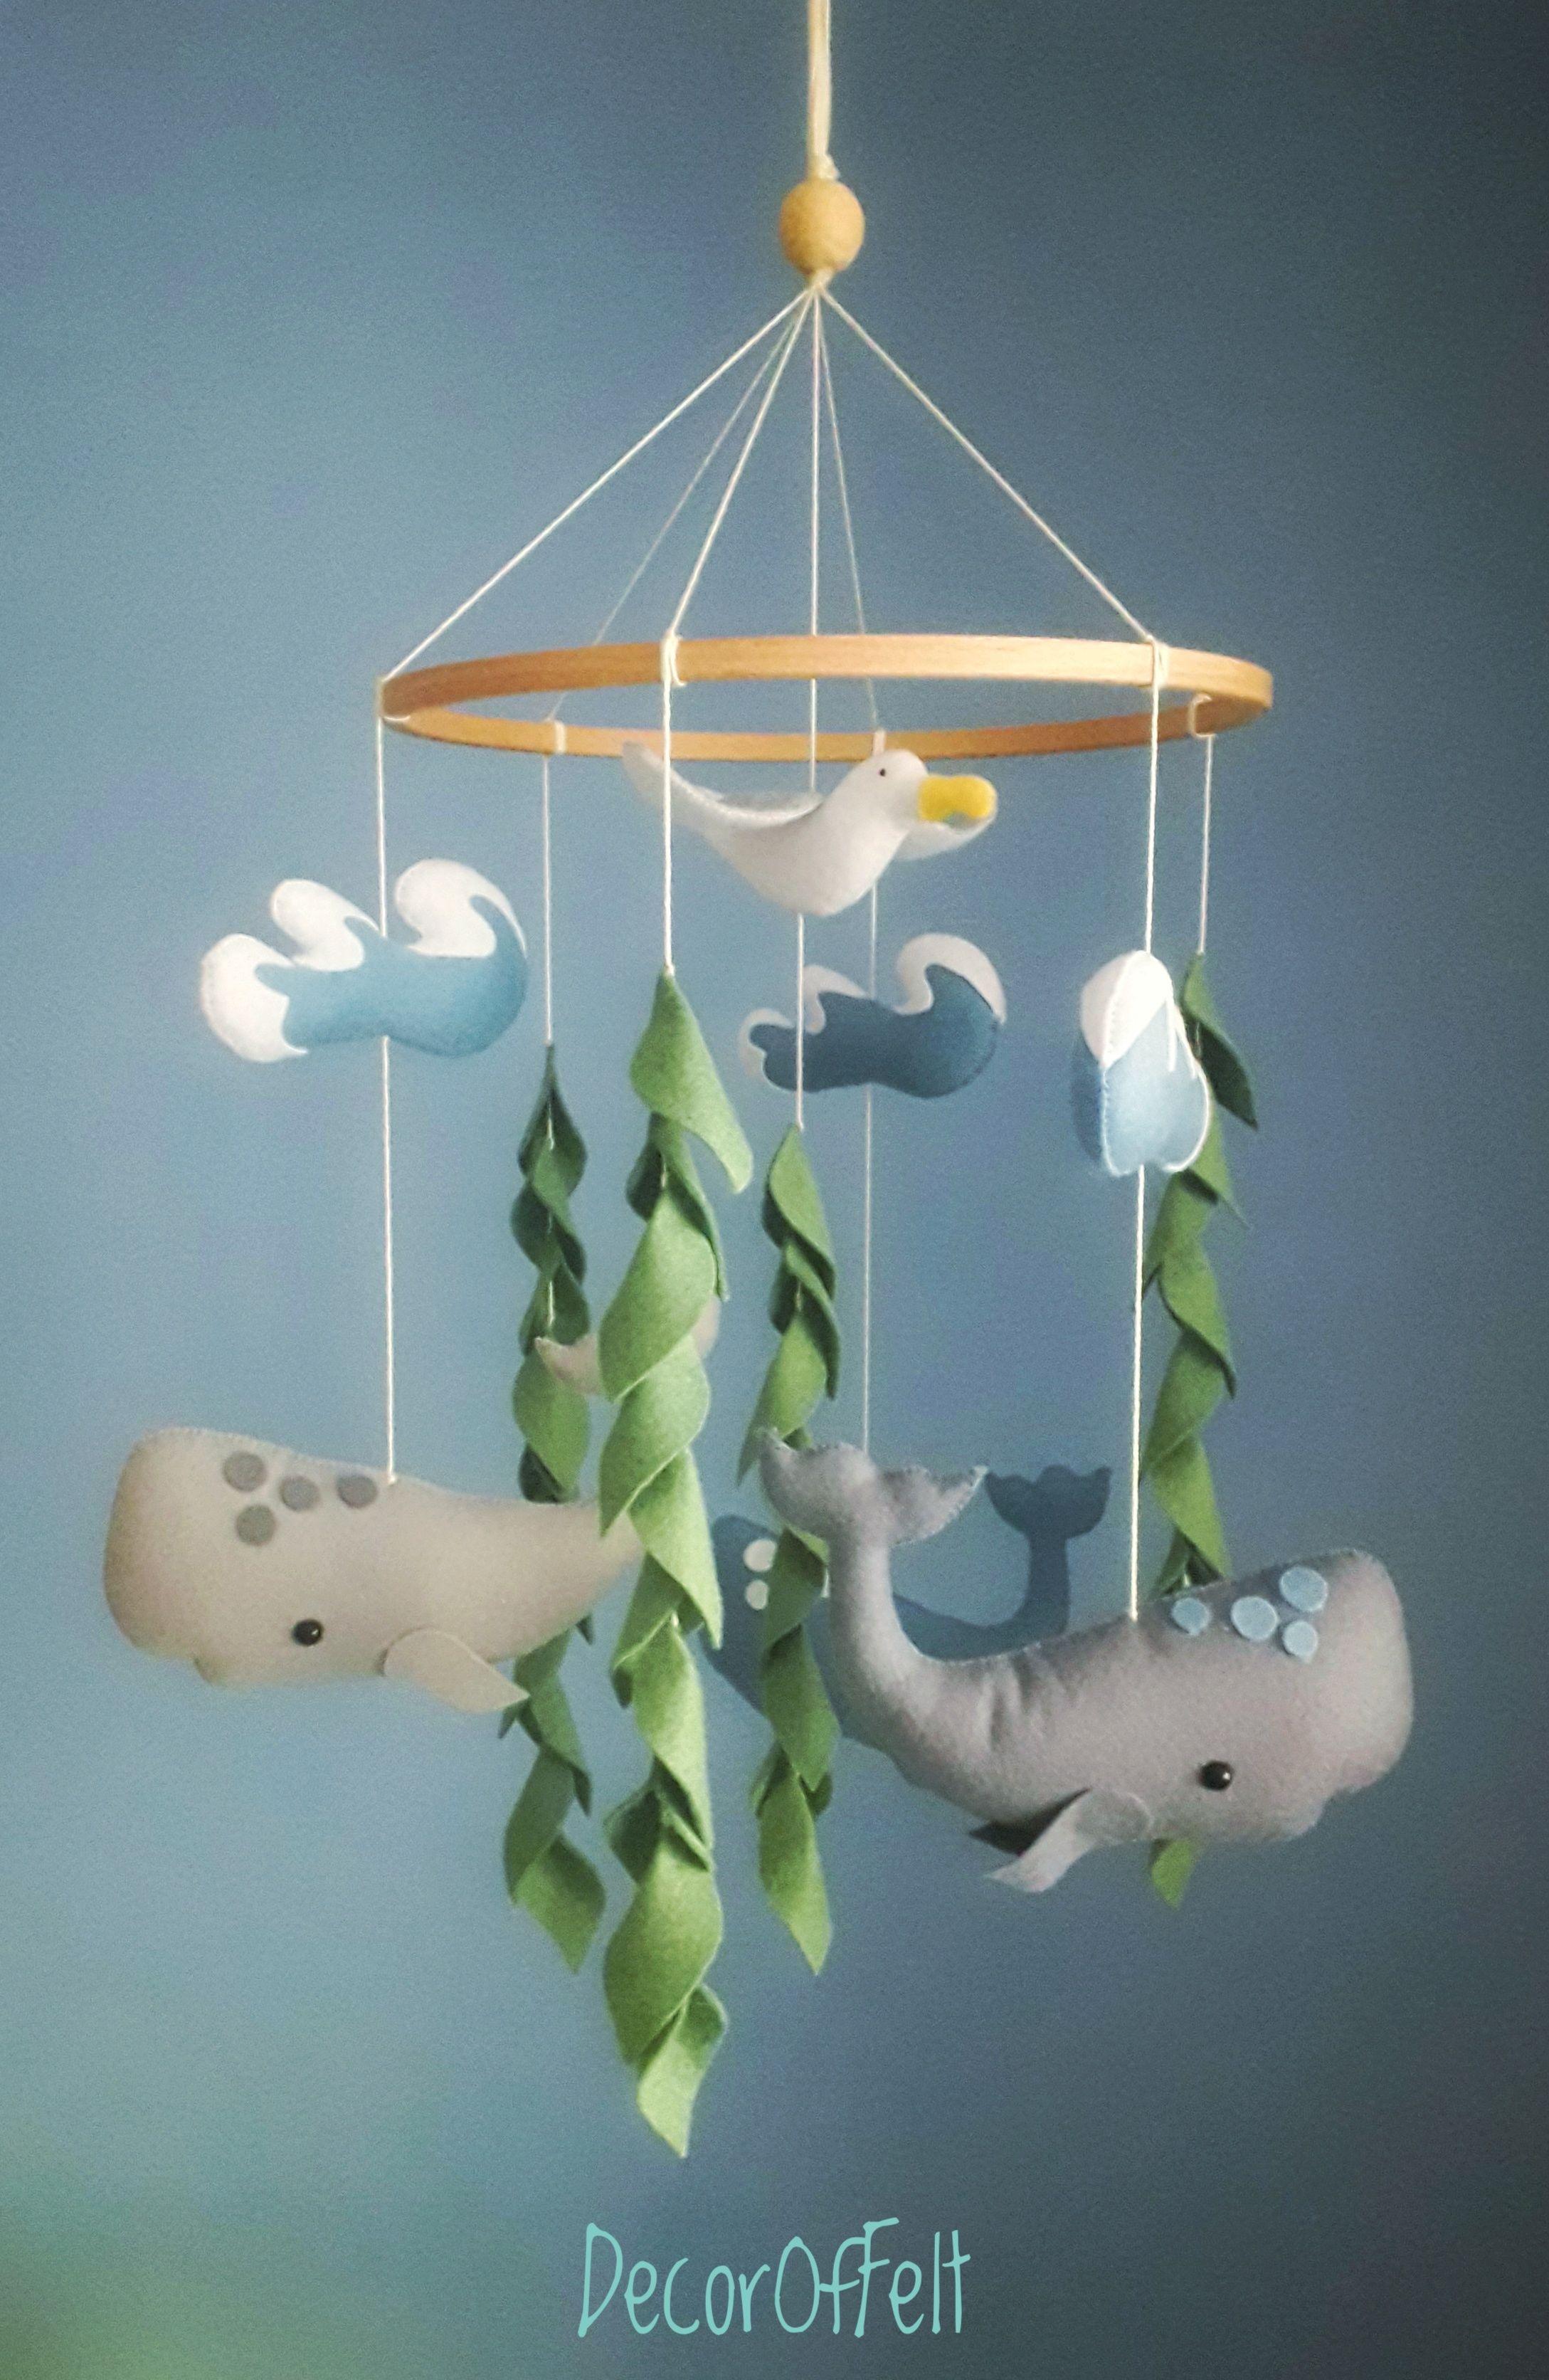 Whale Crib Mobile Nautical Mobile Ocean Theme Decor Sea Mobile Felt Baby Mobile Newborn Mobile V 2020 G